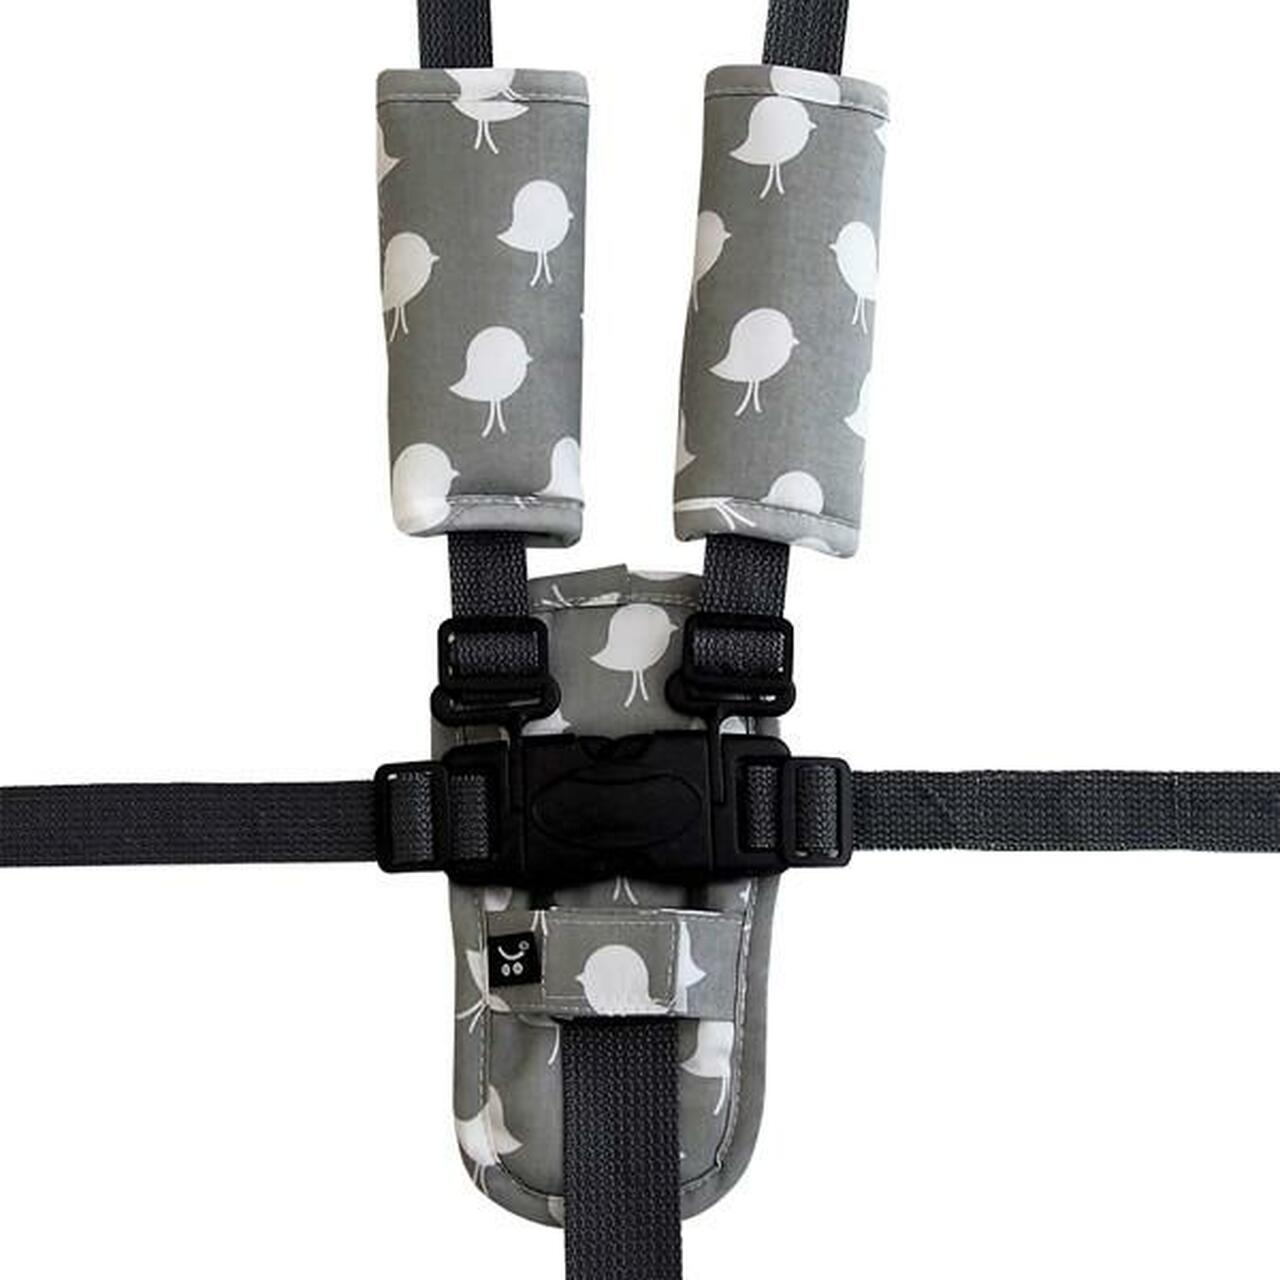 Outlook Pram Harness Cover Set - GREY BIRDS